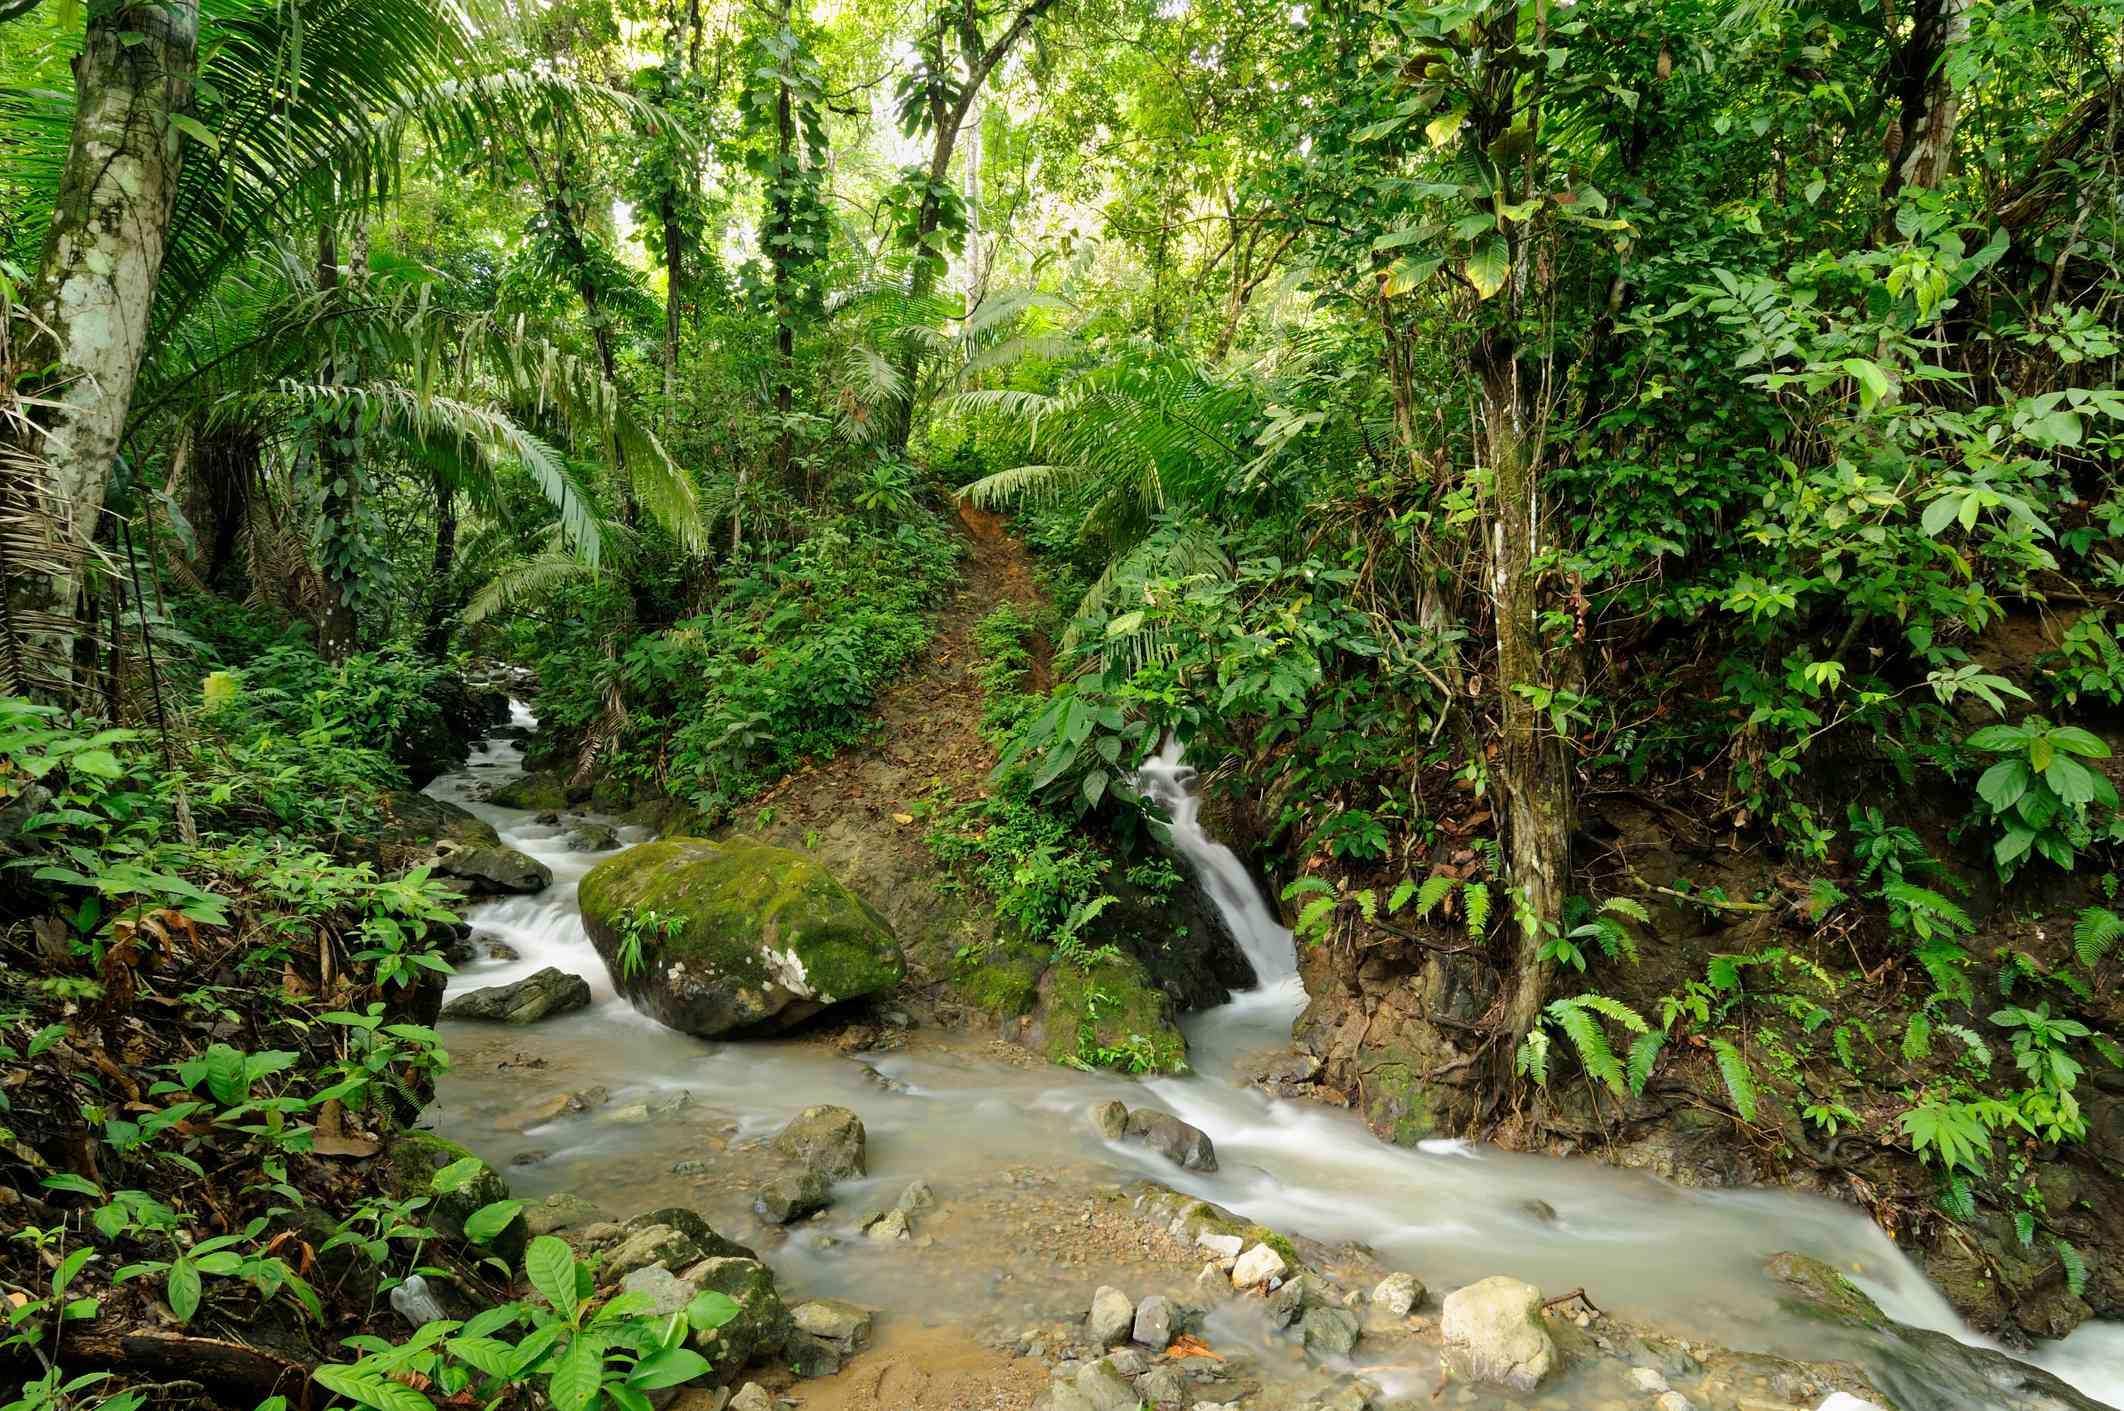 Darien jungle near the border of Columbia and Panama